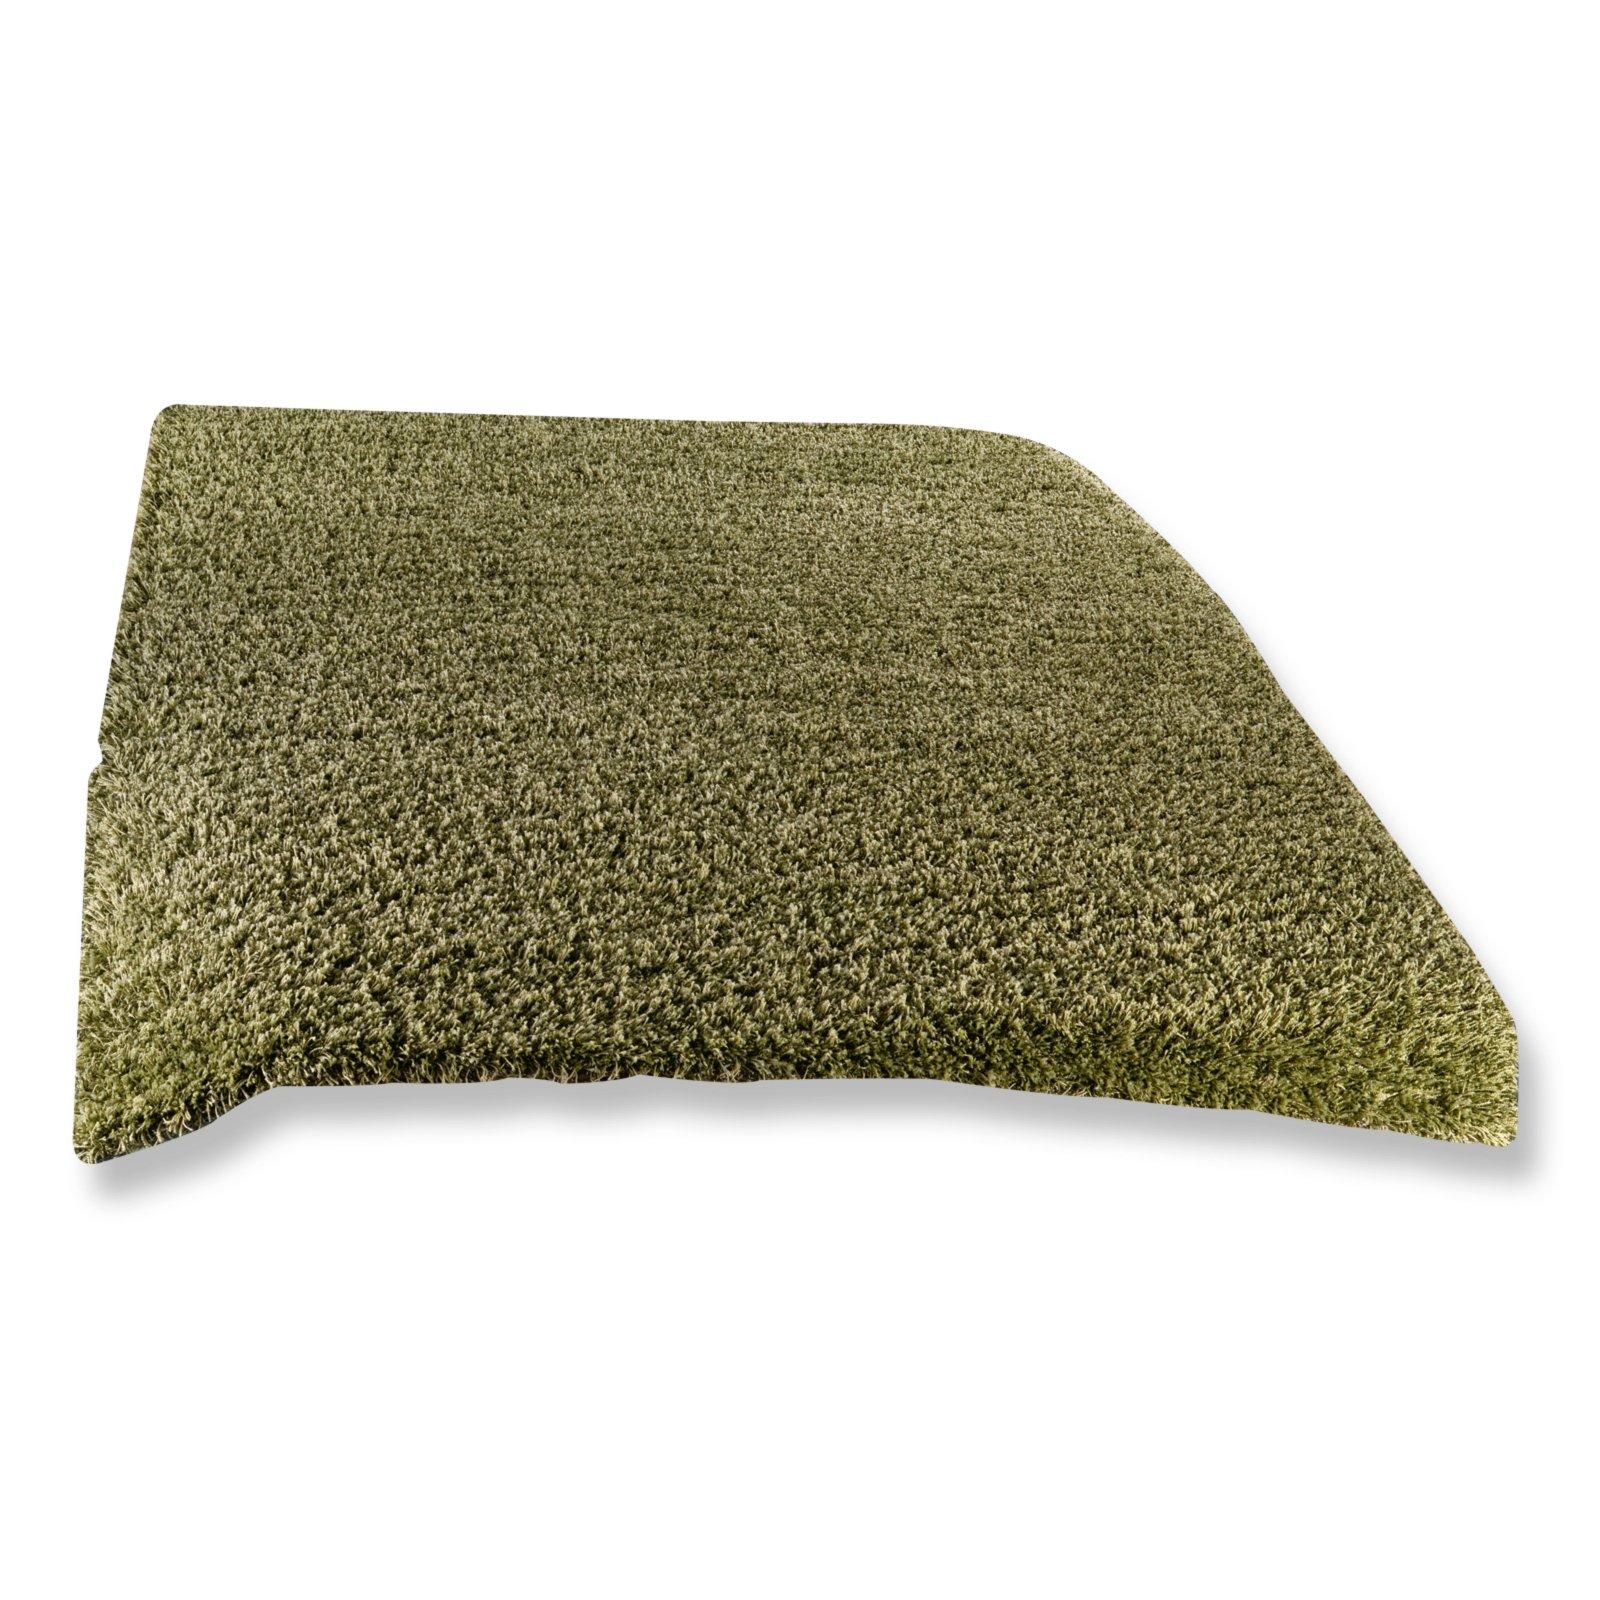 hochflor teppich shaggy plus gr n 120x170 cm hochflor shaggyteppiche teppiche. Black Bedroom Furniture Sets. Home Design Ideas